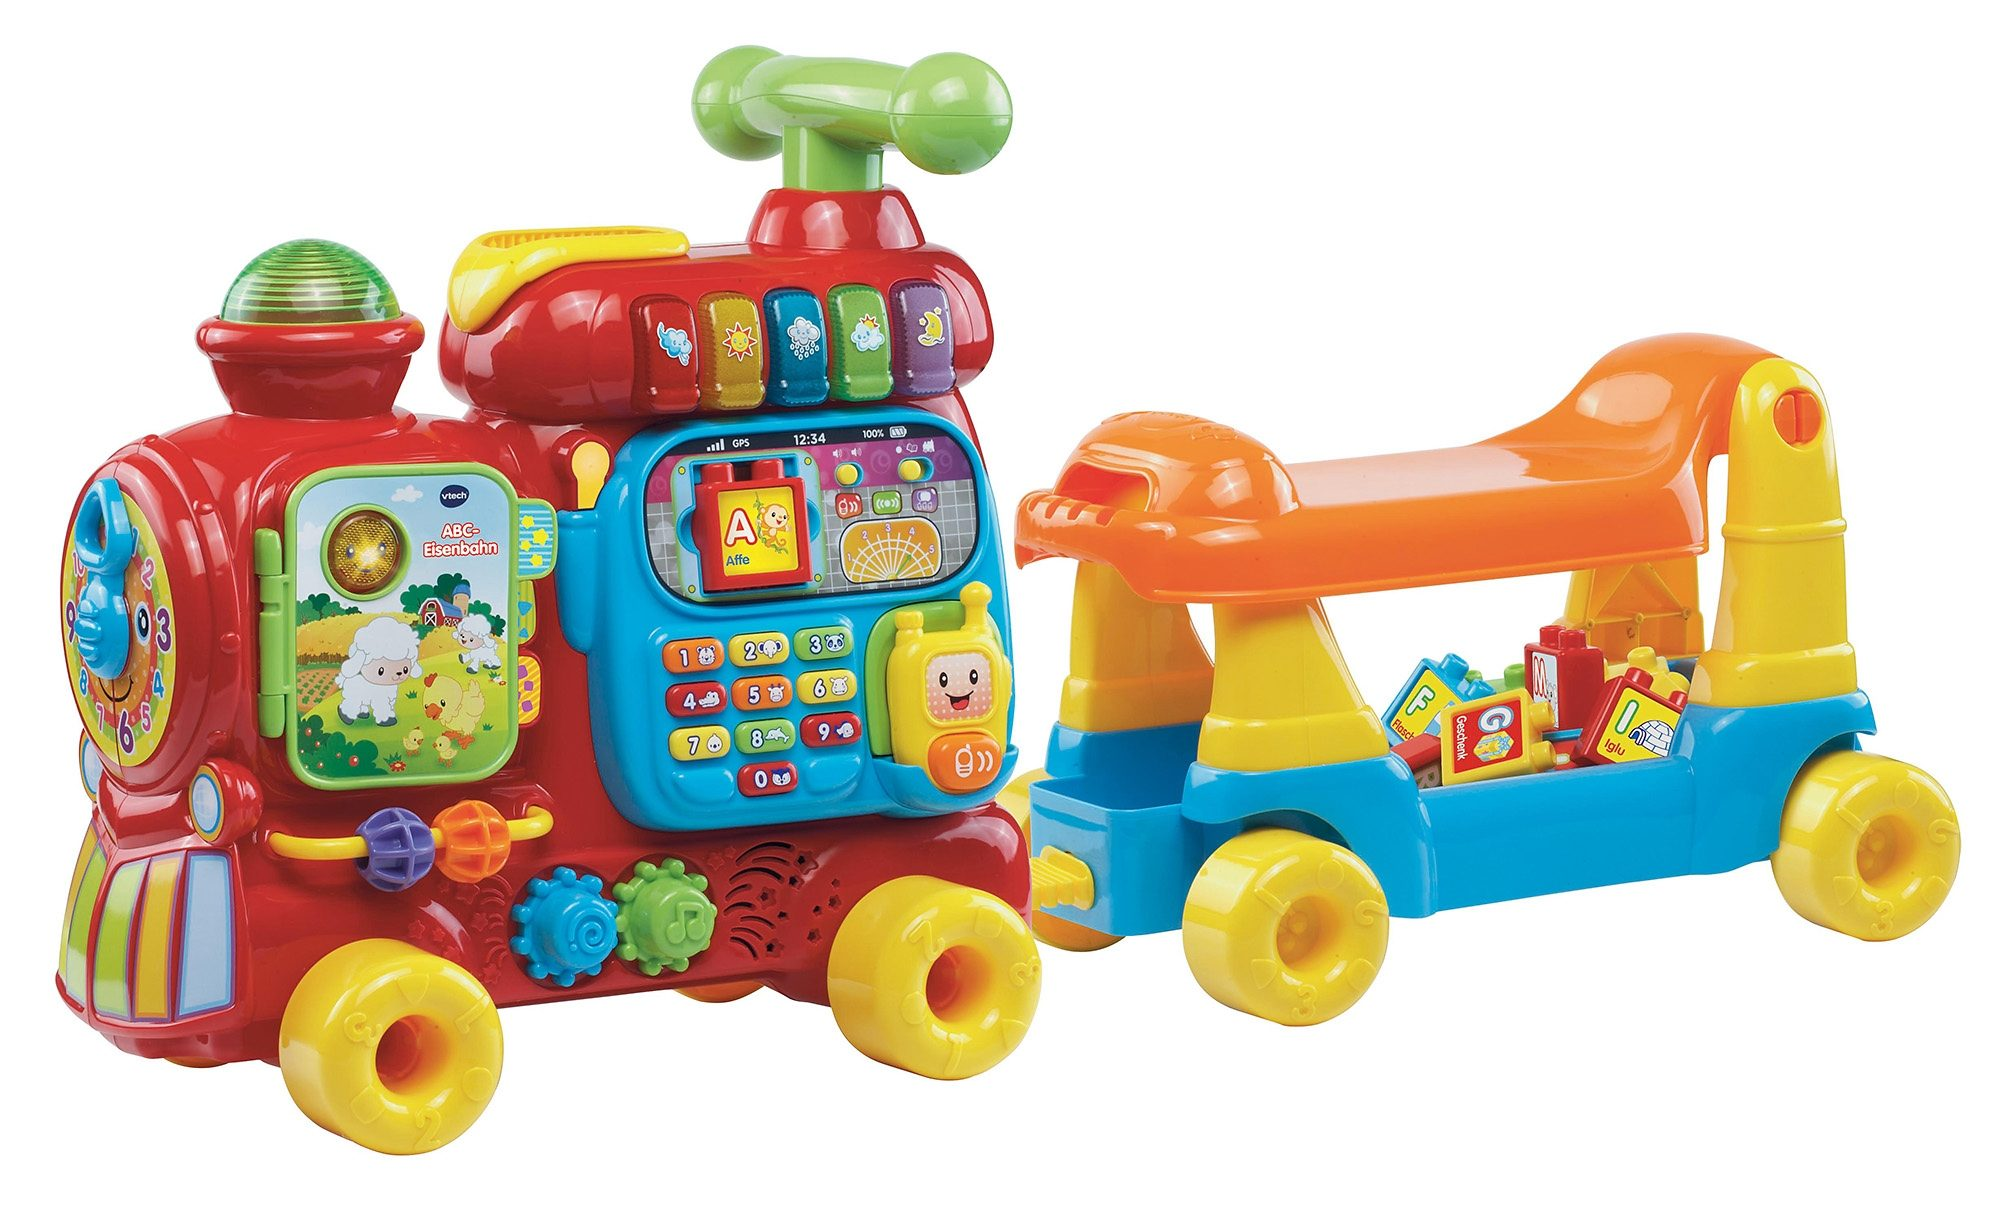 VTech Lernspielzeug 15-tlg ABC-Eisenbahn Kindermode/Spielzeug/Lernspielzeug/Lernspiele